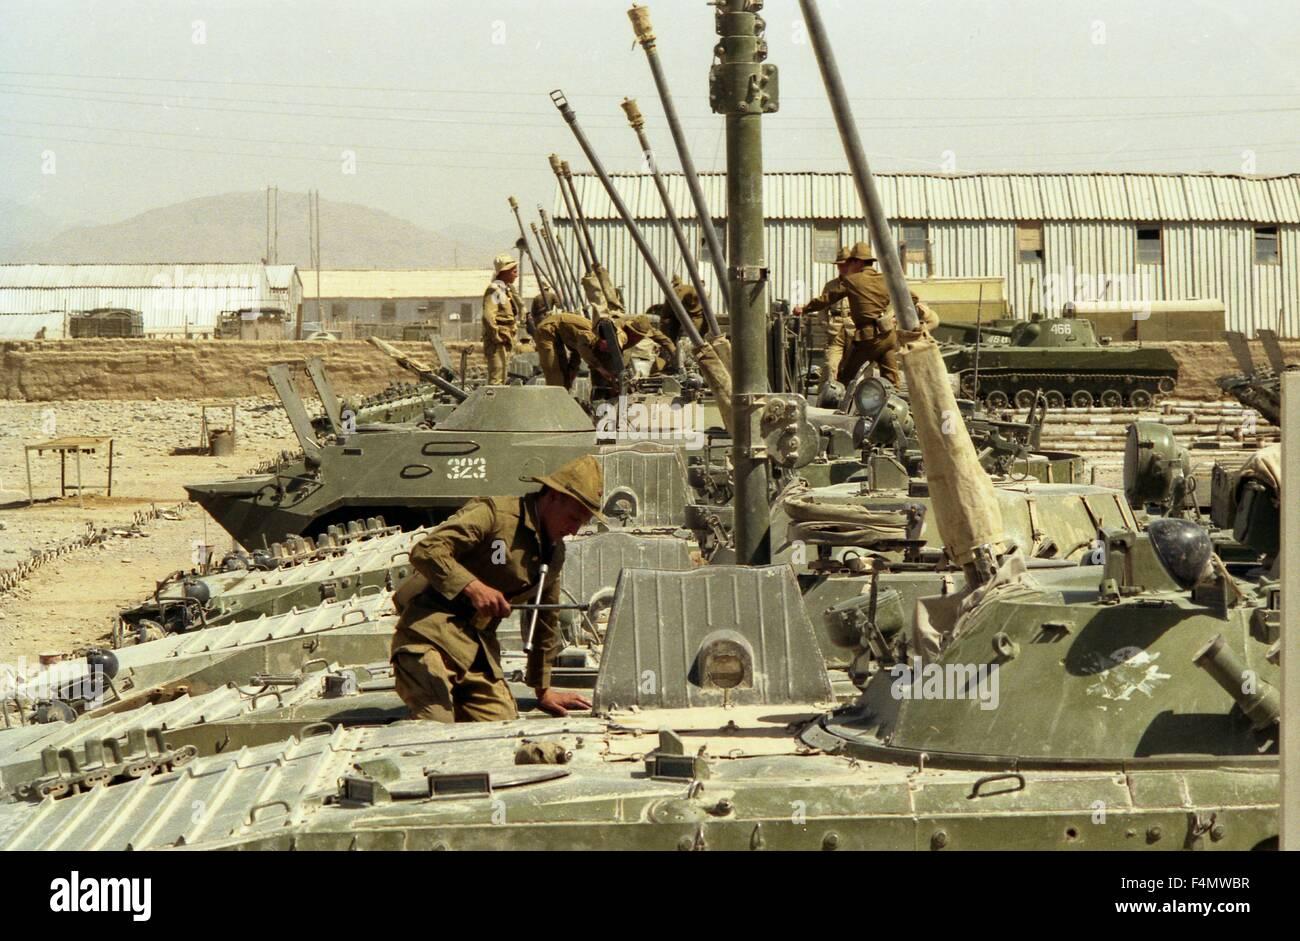 Soviet Afghanistan war - Page 6 Afghanistan-the-soviet-soldiers-repair-military-technics-F4MWBR